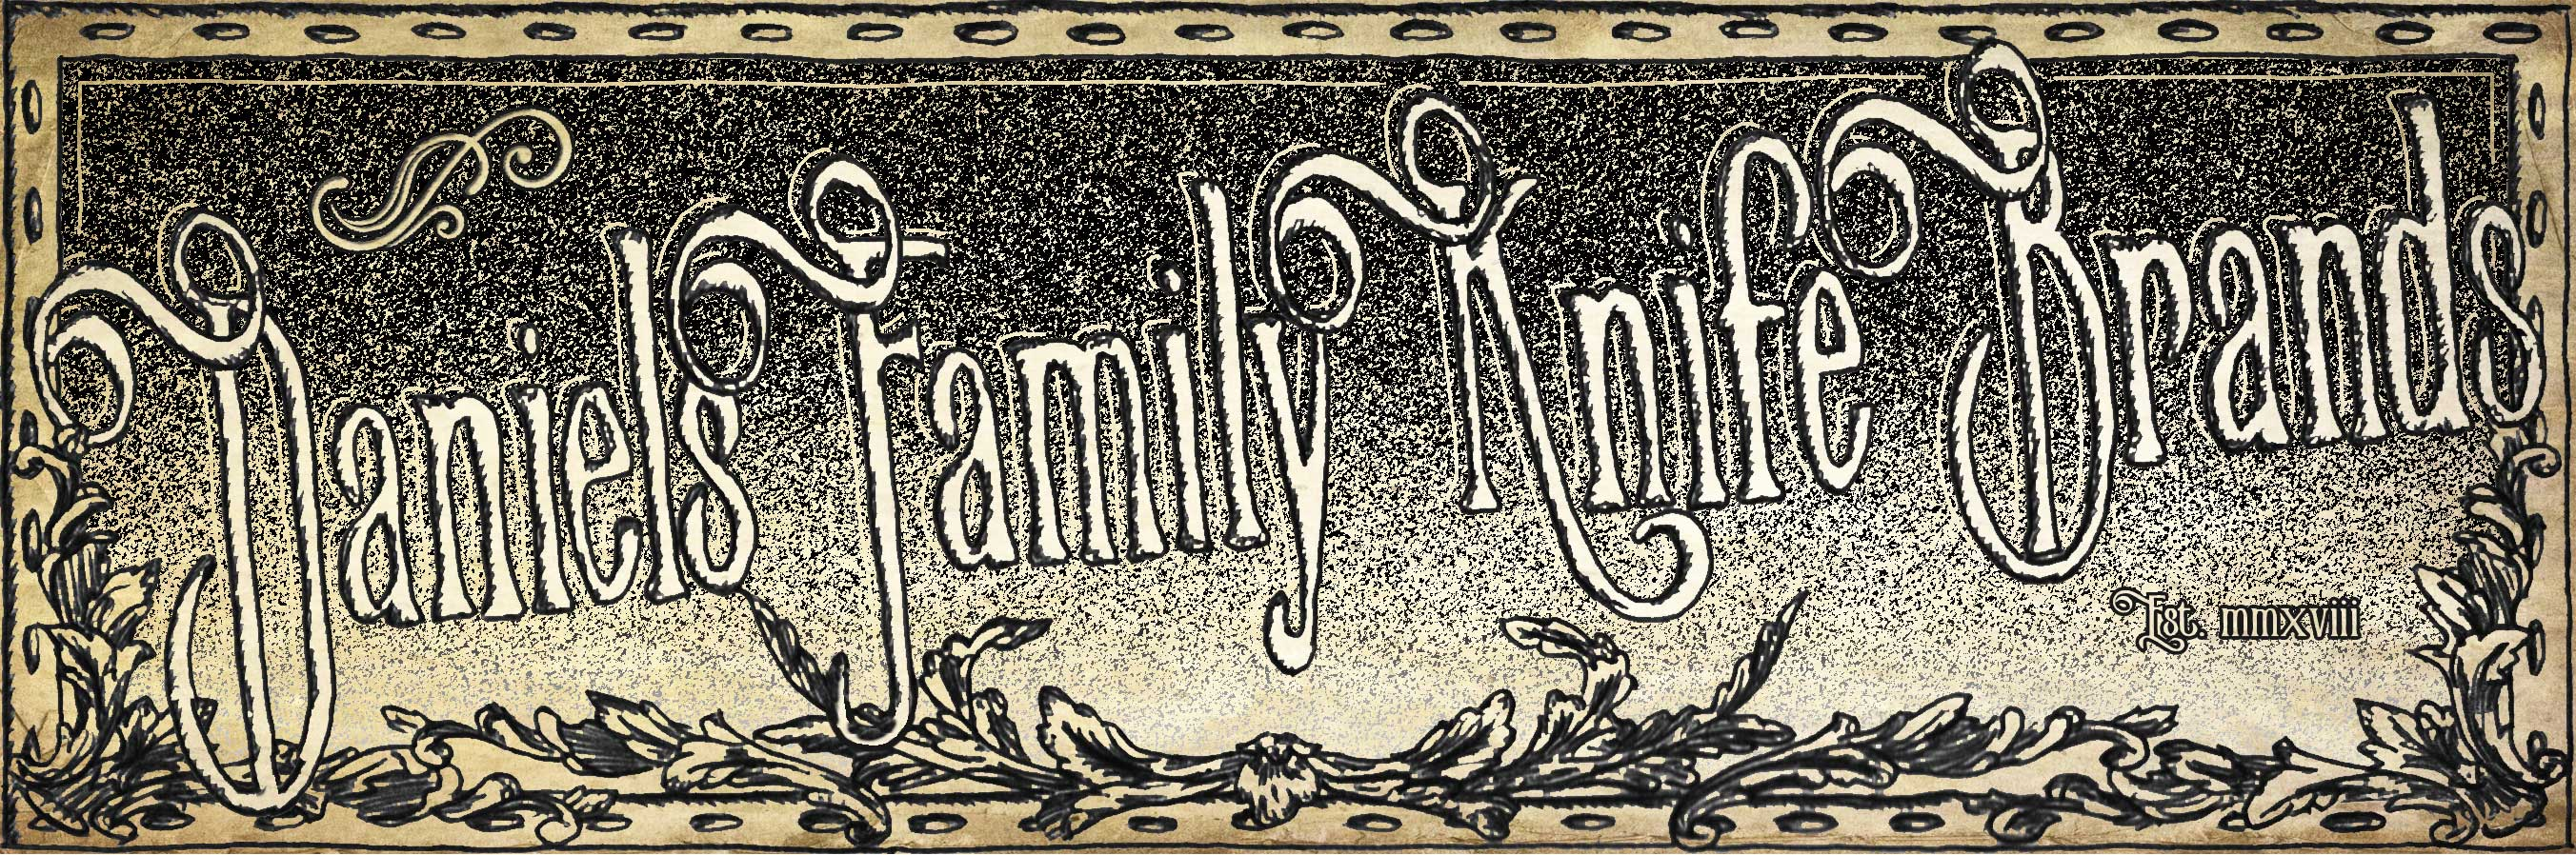 Daniels Family Knife Brands image